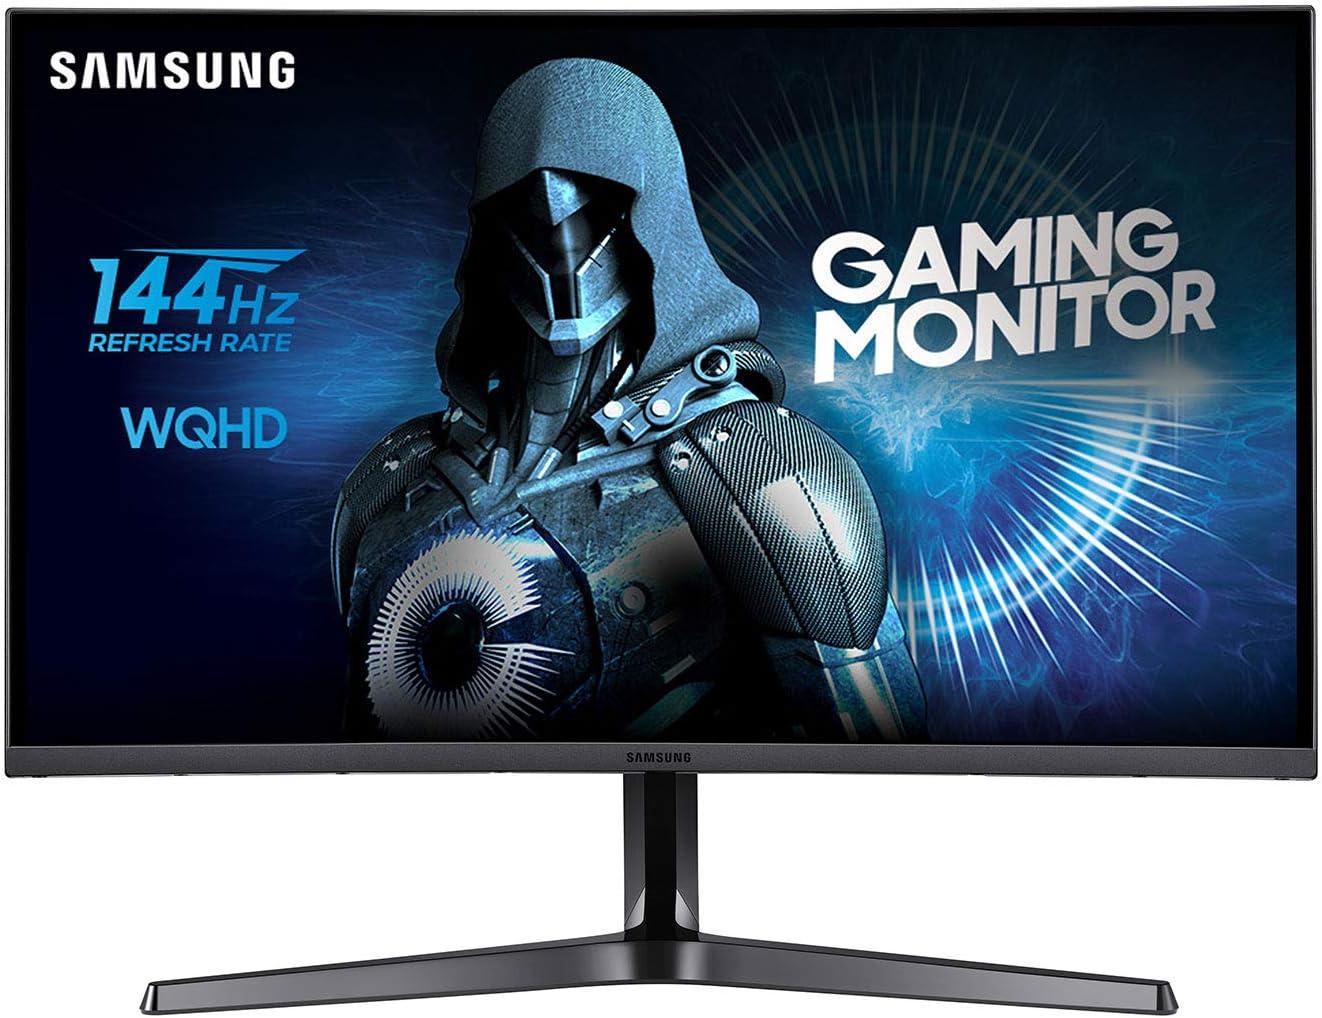 Samsung C27jg50 Monitor Wqhd Computers Accessories